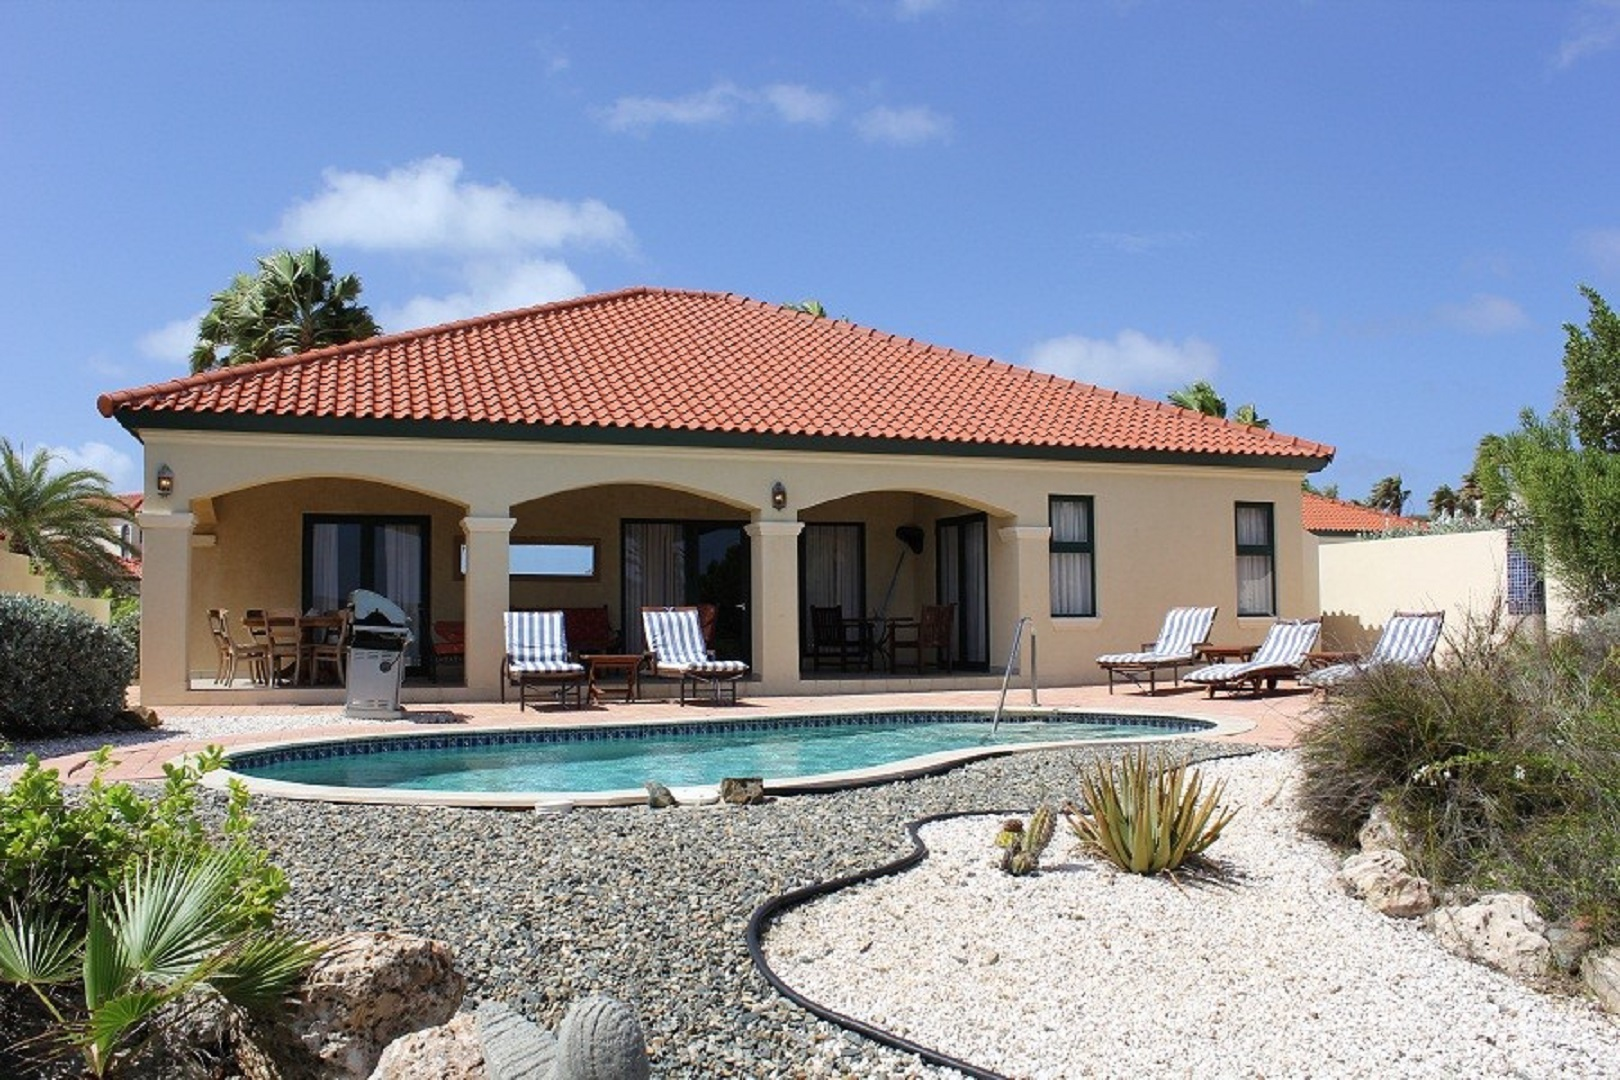 A Villa Paradiso, located on Tierra del Sol photo 27925765